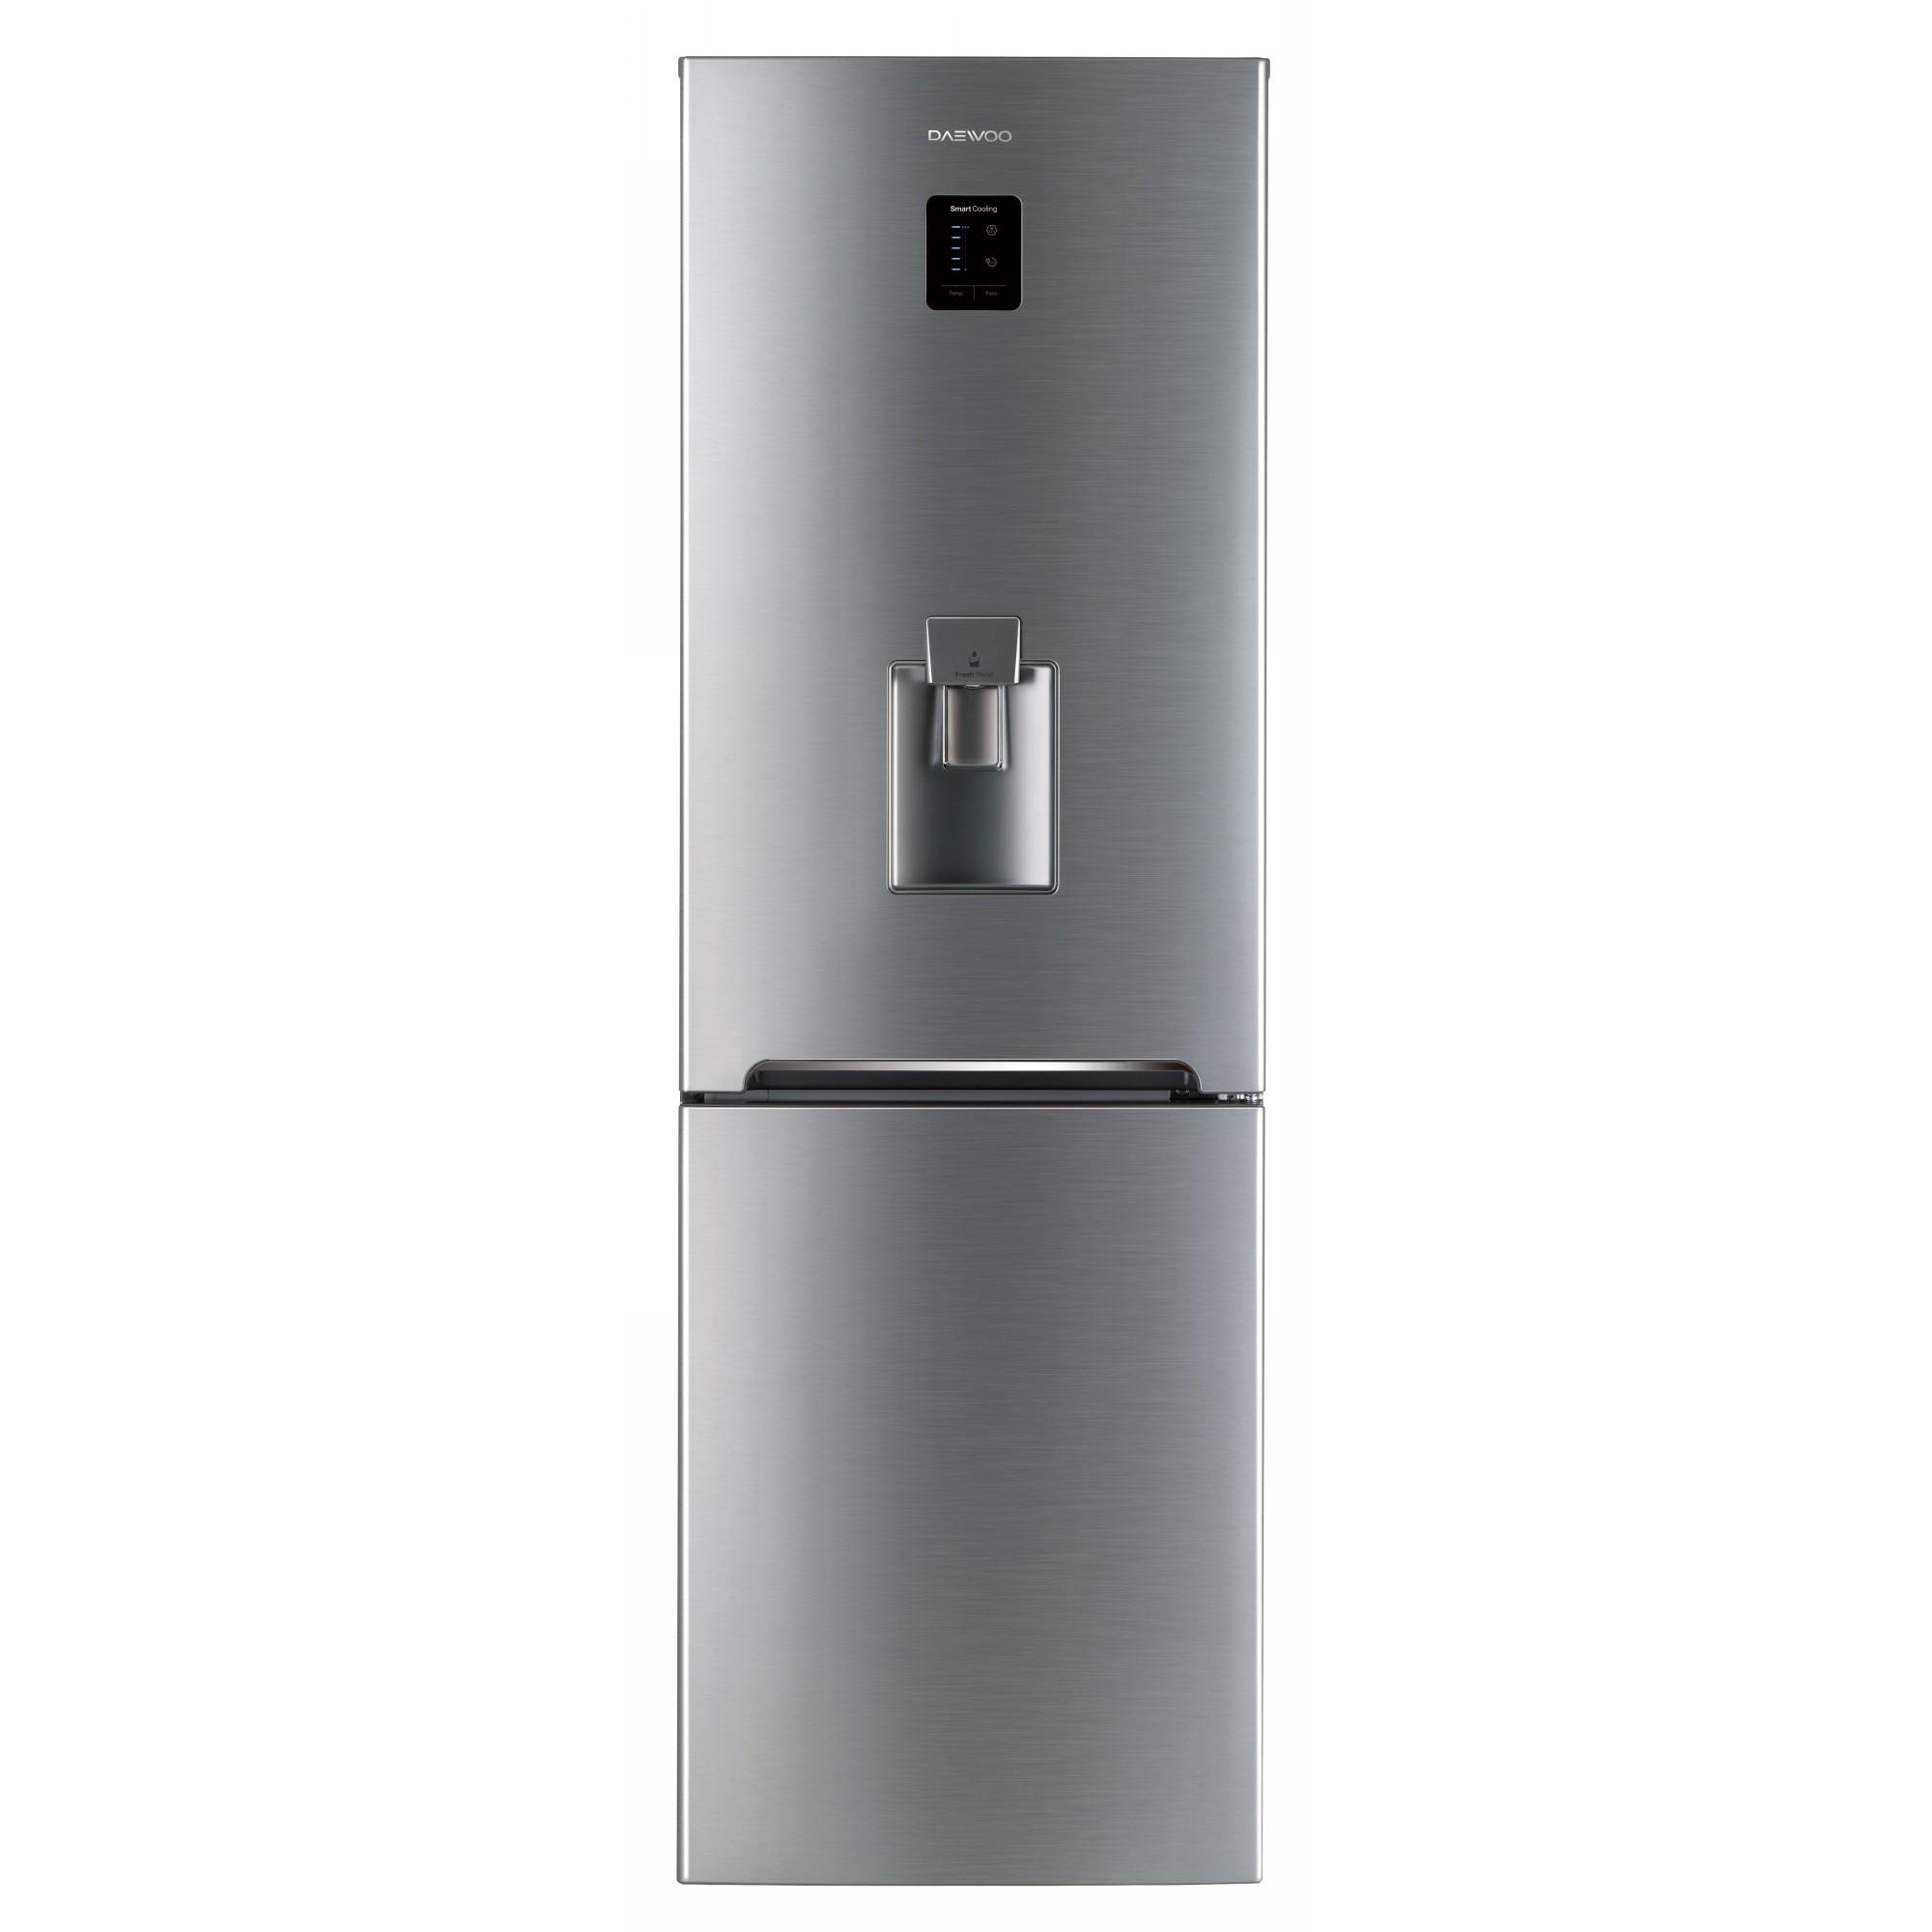 Fotografie Combina frigorifica Daewoo RN-307RDQM, 305 l, Clasa A+, No Frost, Display, Dispenser apa, H 187 cm, Silver